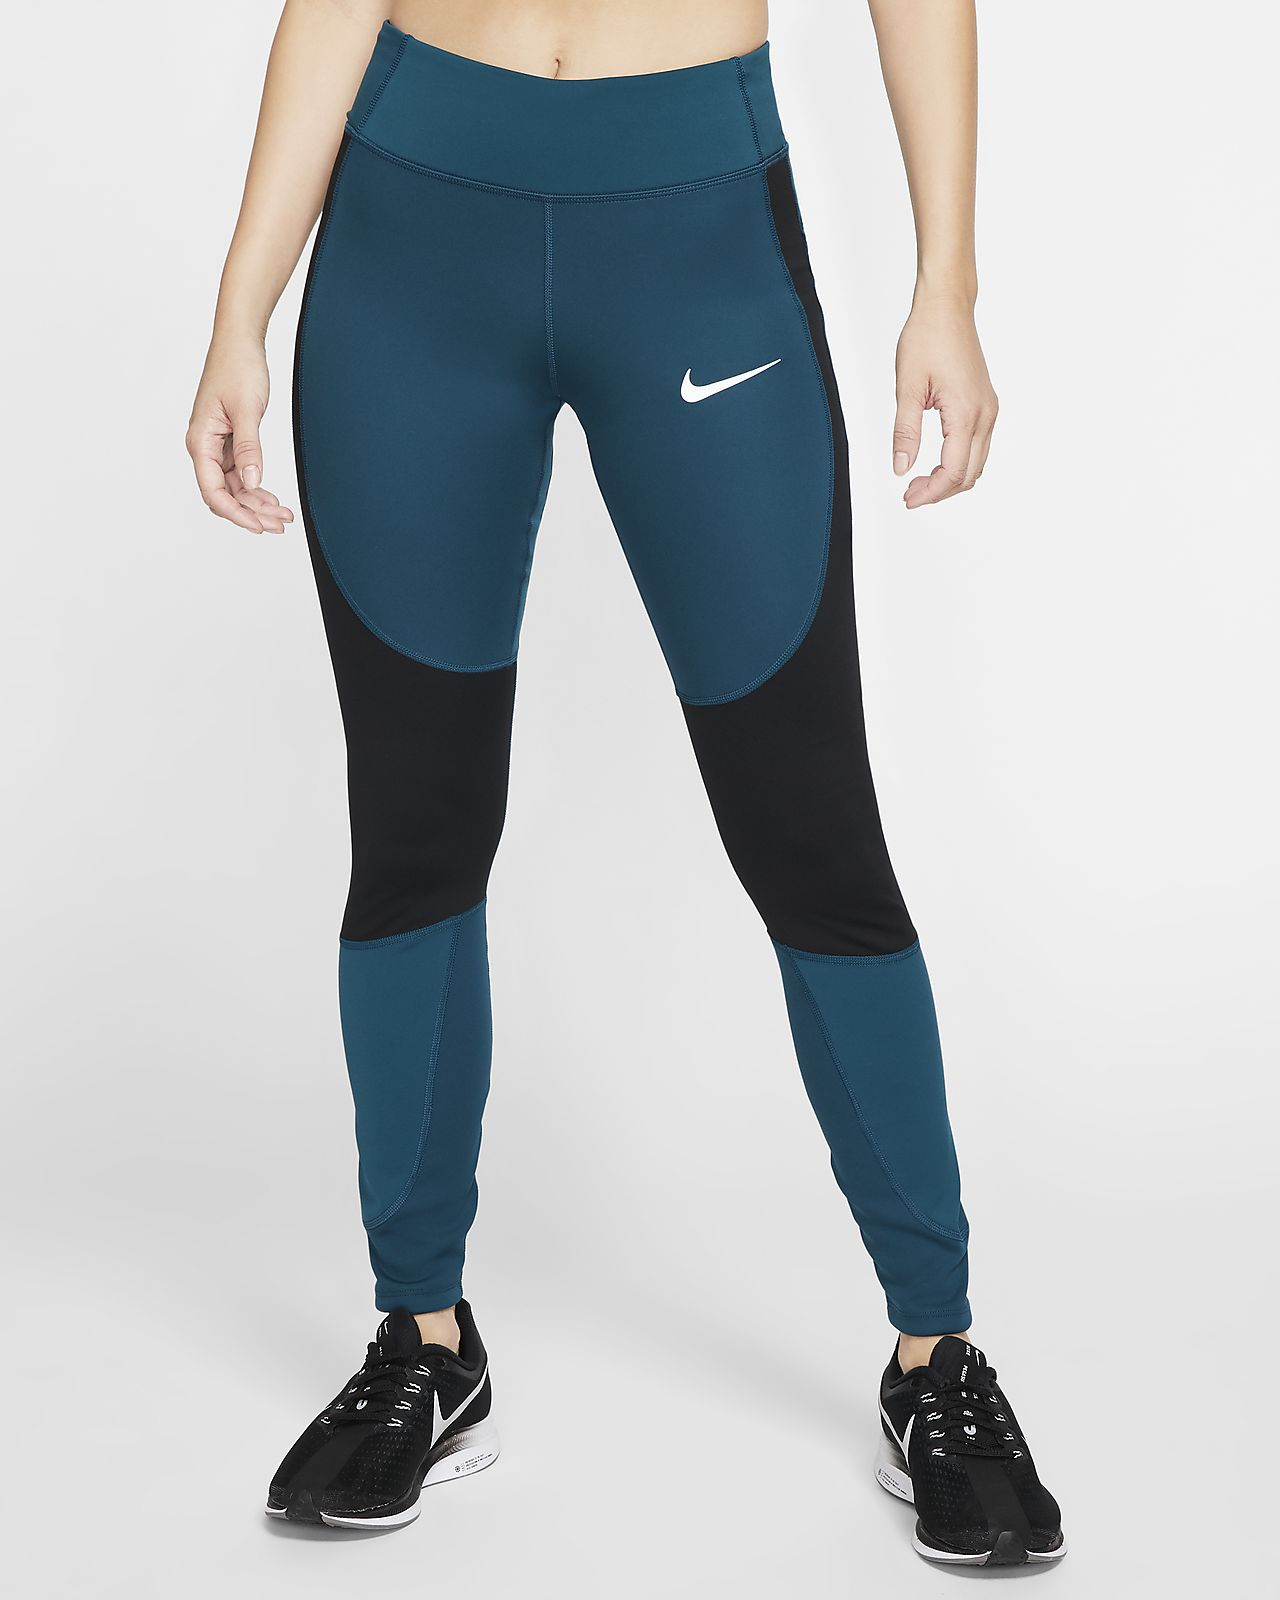 Nike Epic Lux Repel Women's Running Leggings